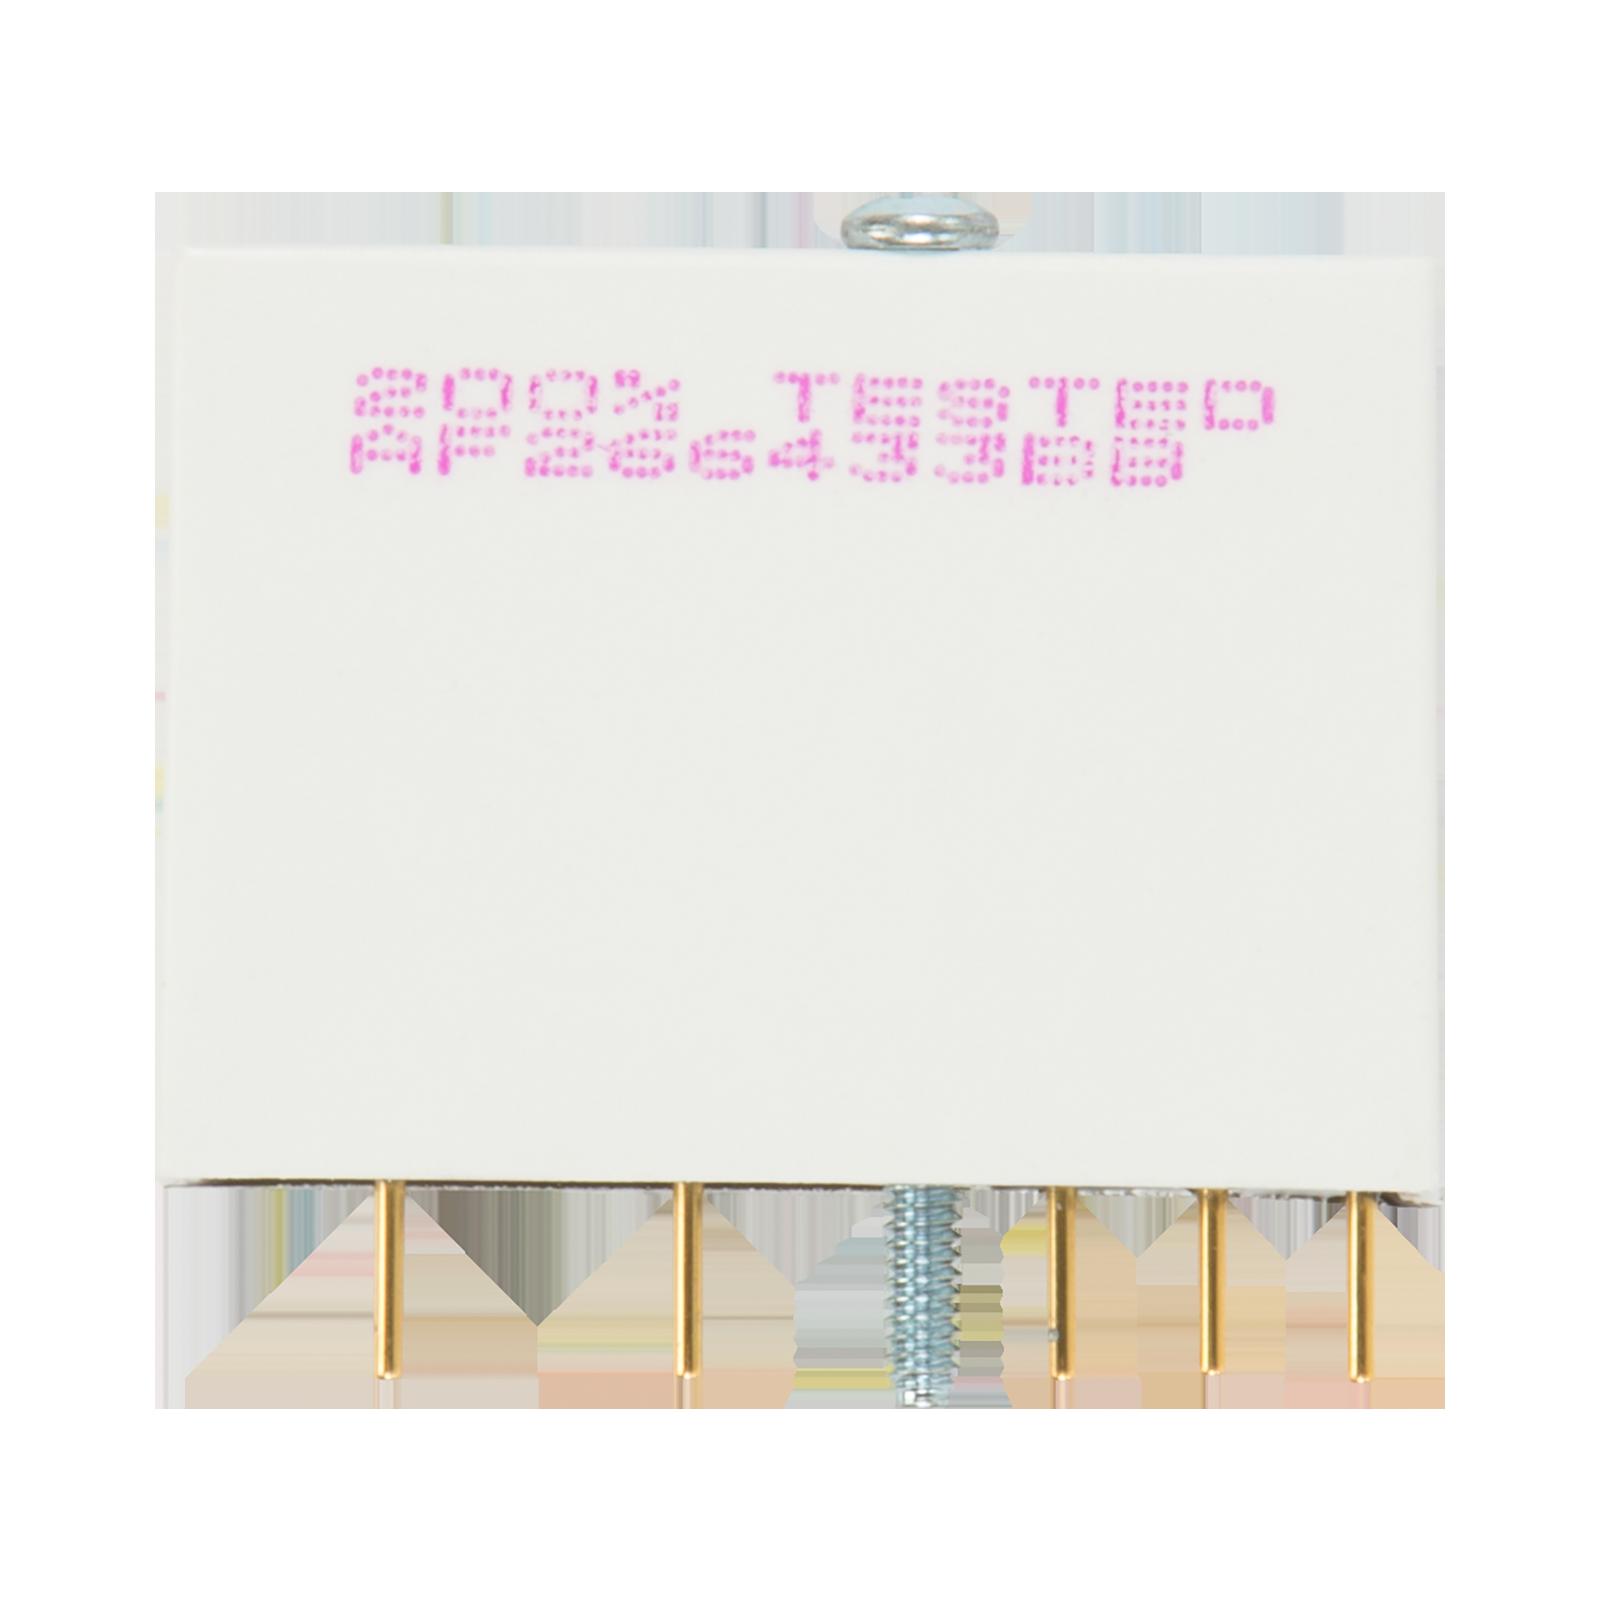 Opto22 Idc5d G1 Dc Digital Input 25 28 Vdc 5 Logic International 140 Wiring Diagram